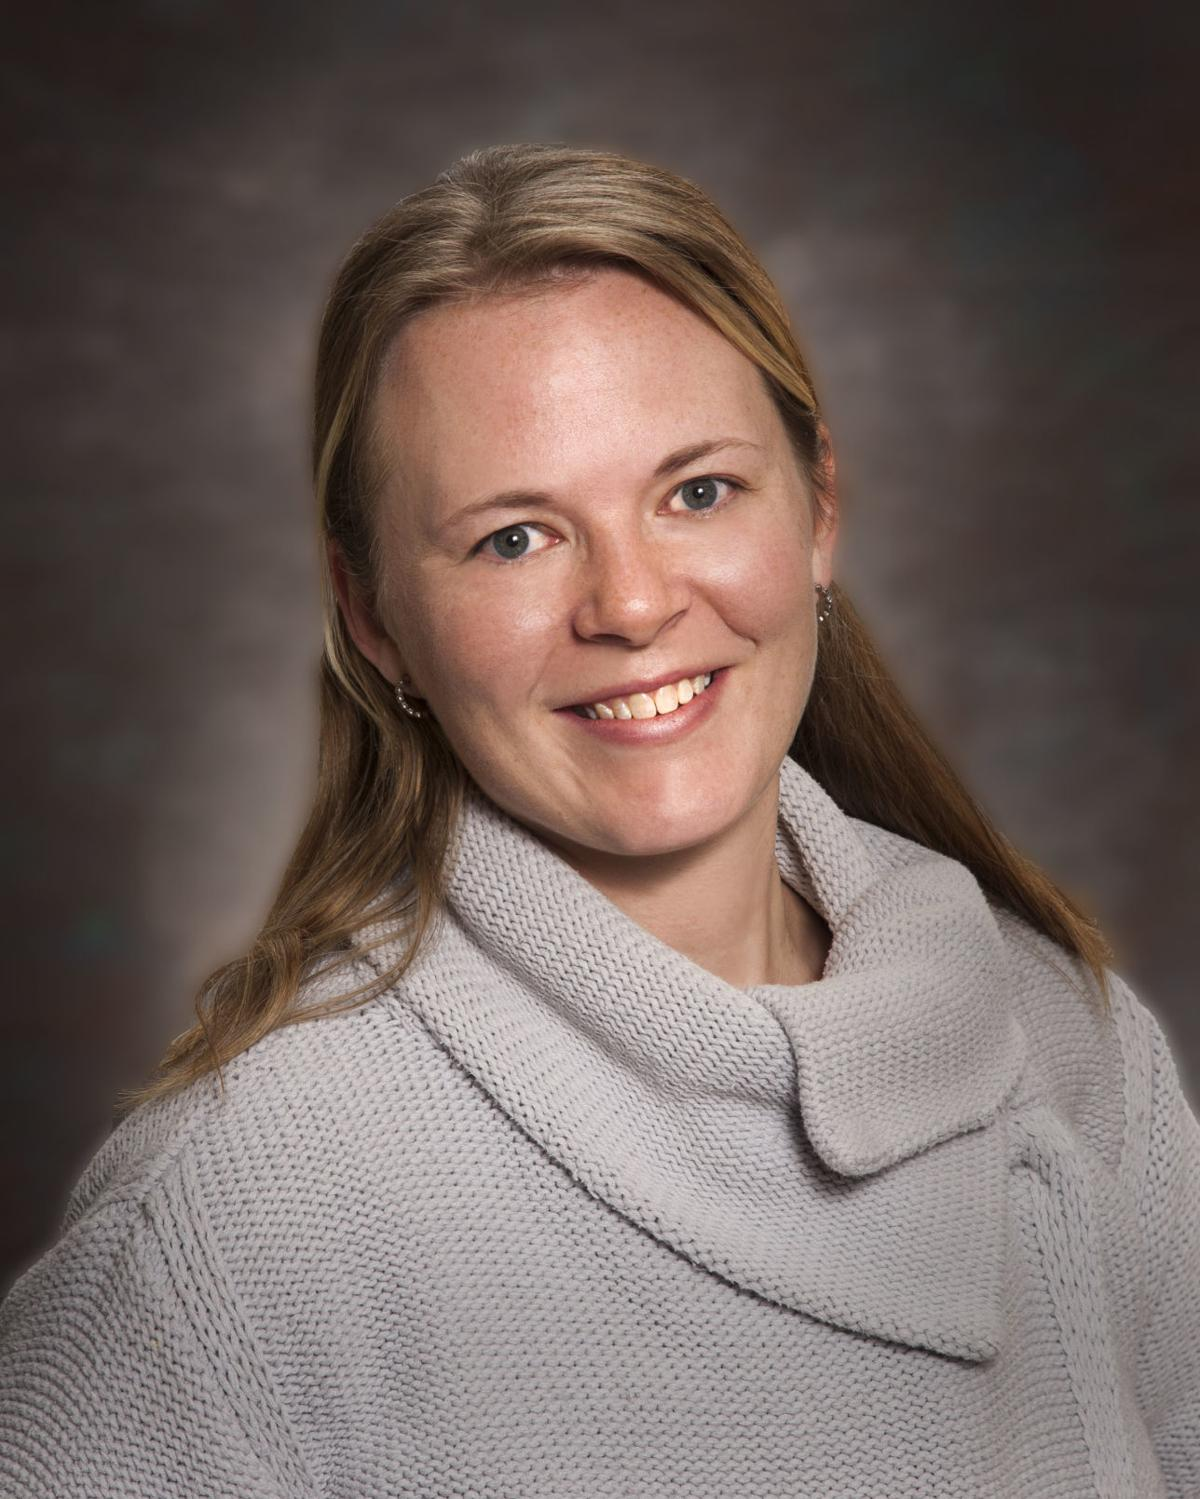 Melissa Graven